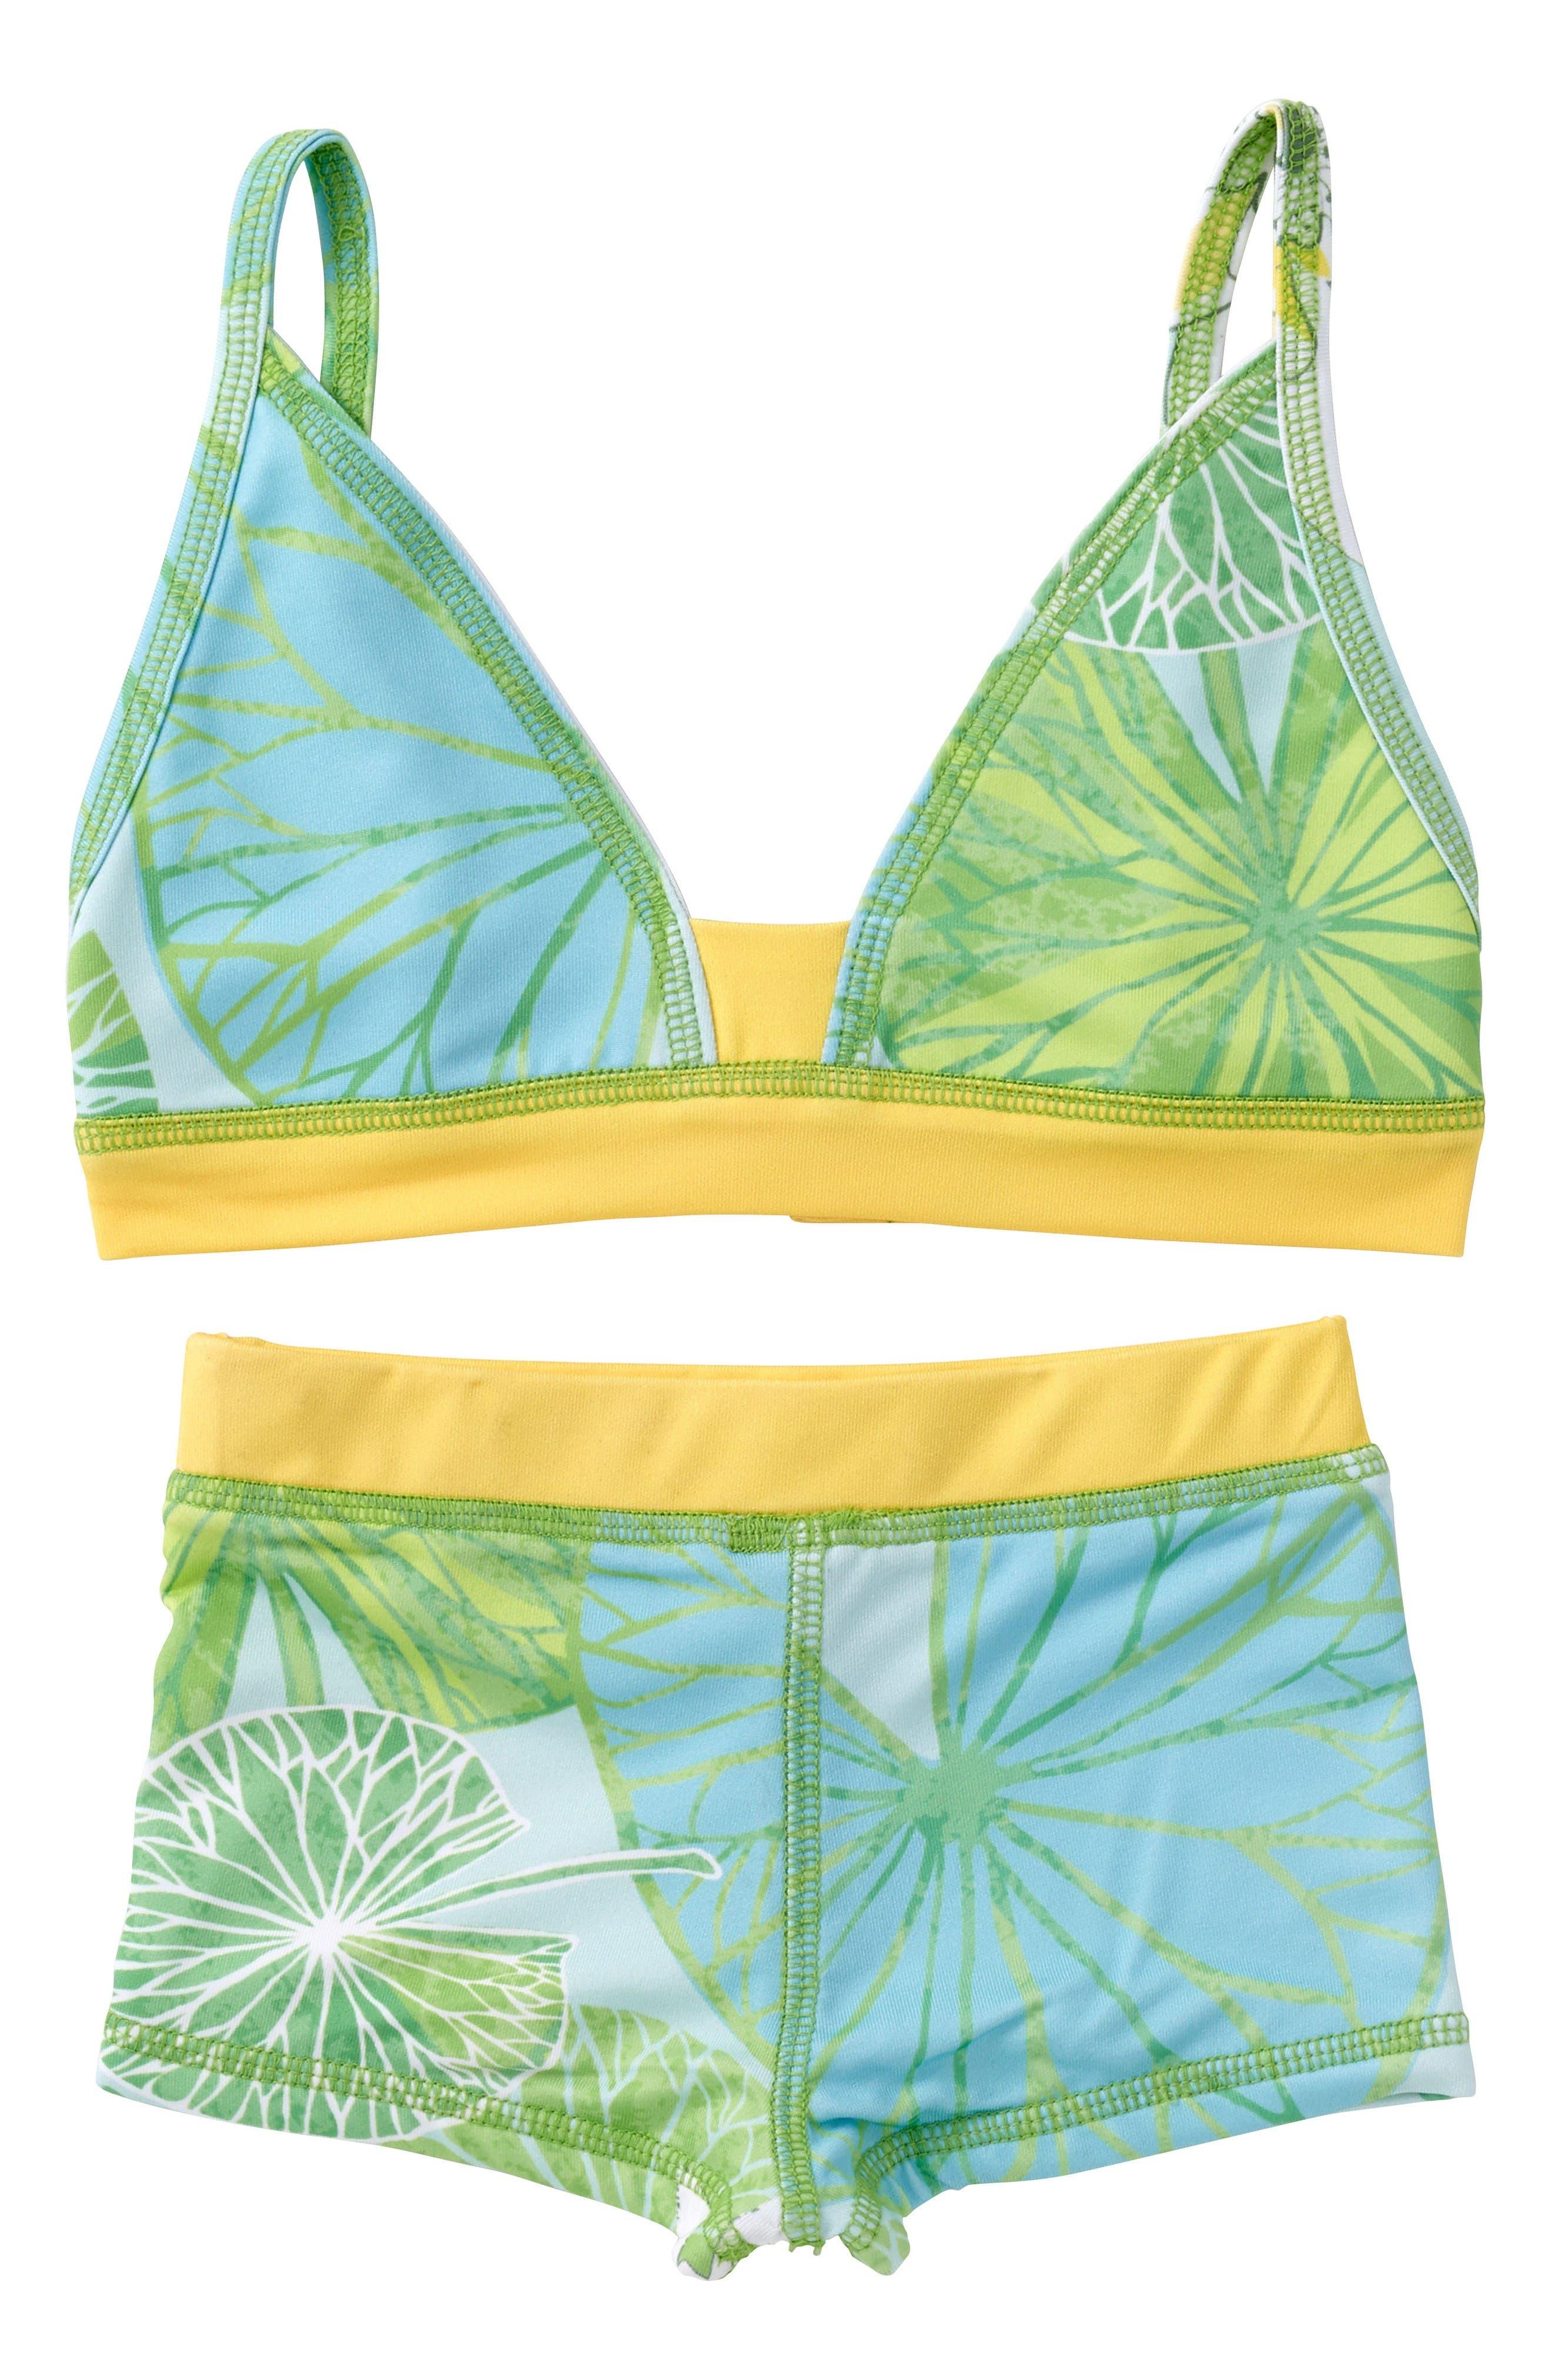 Main Image - Masasla Baby Two-Piece Swimsuit (Toddler Girls, Little Girls & Big Girls)